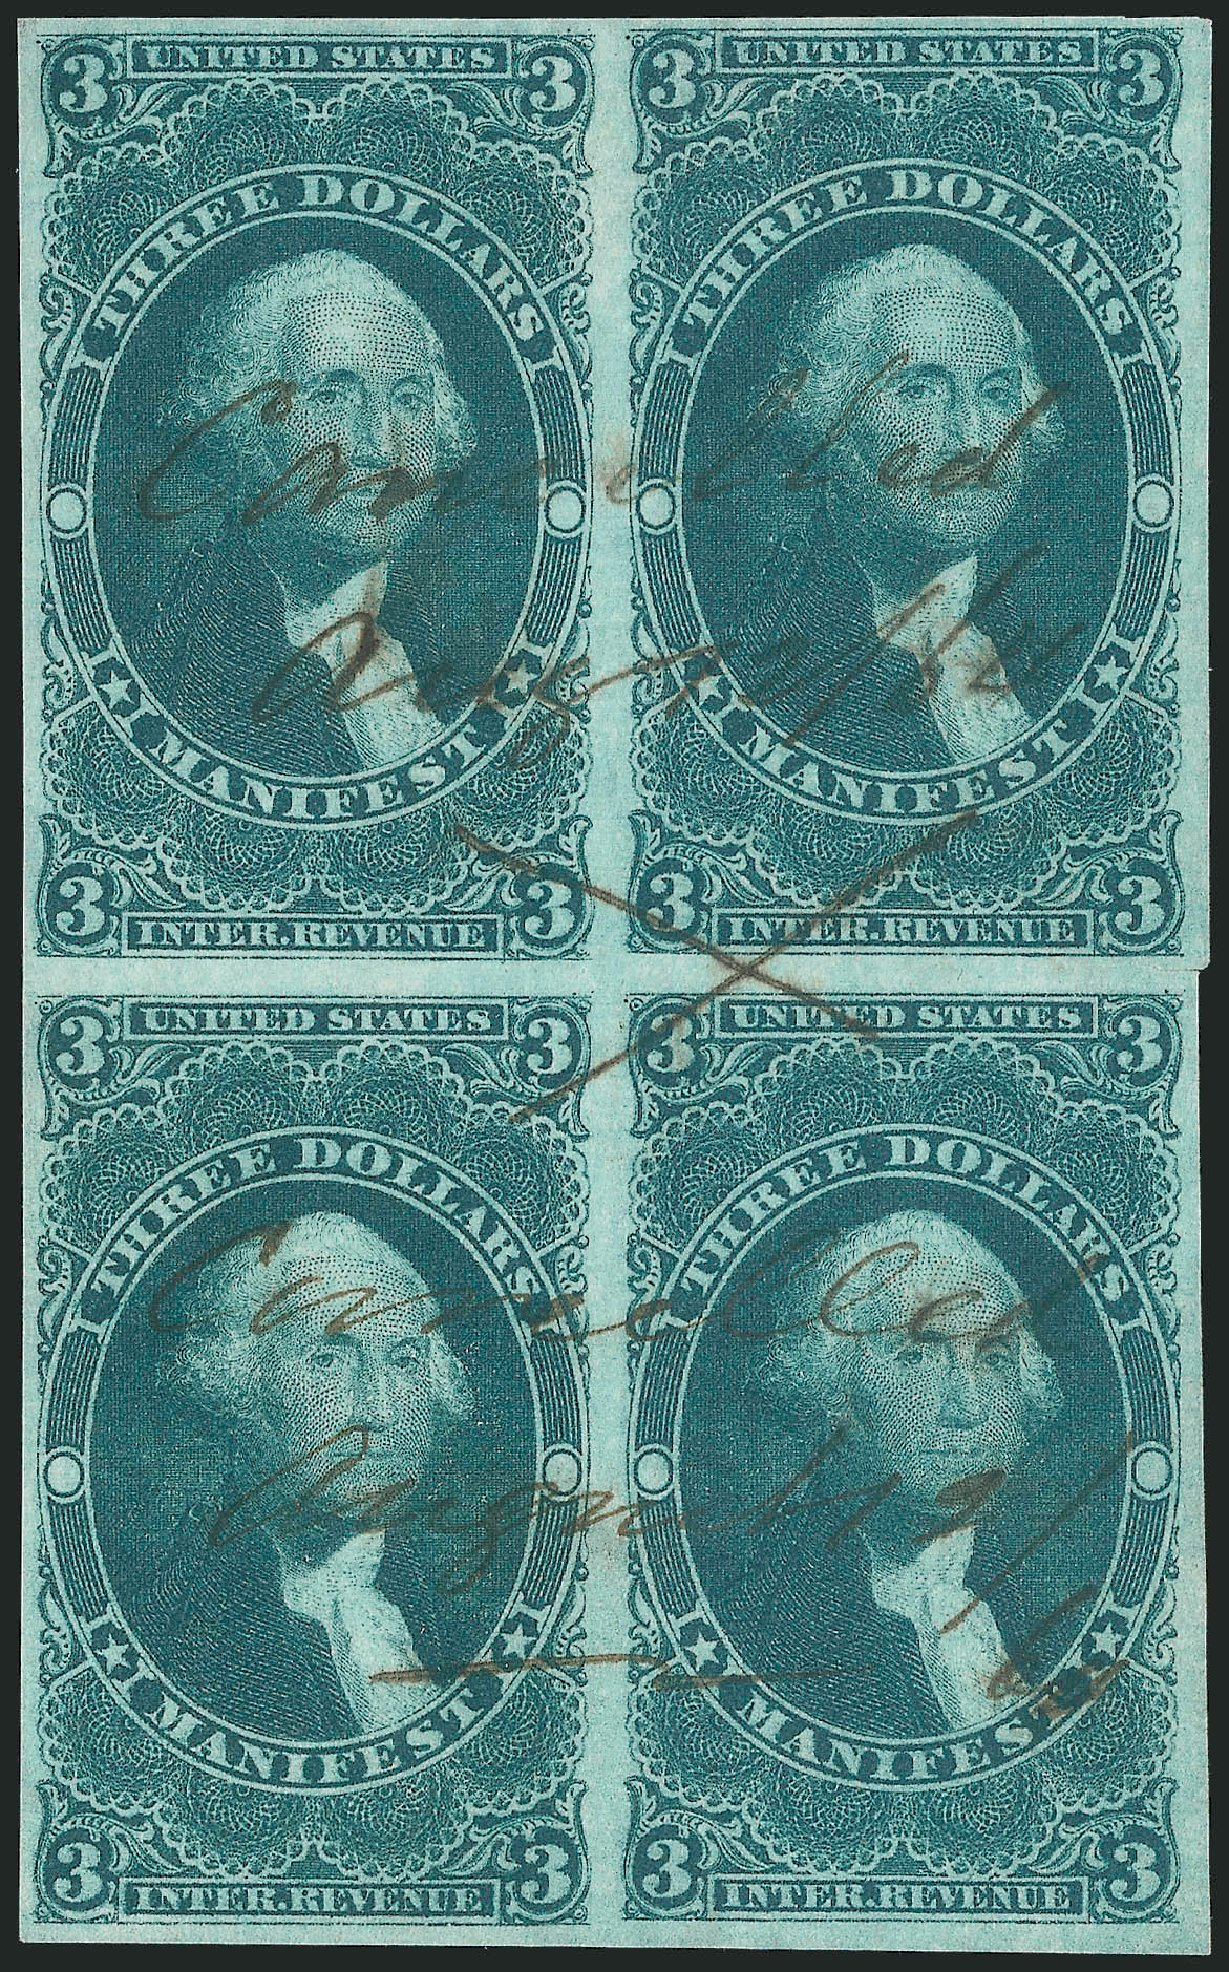 US Stamp Prices Scott Catalog # R86 - US$3.00 1862 Revenue Manifest. Robert Siegel Auction Galleries, Dec 2014, Sale 1089, Lot 367